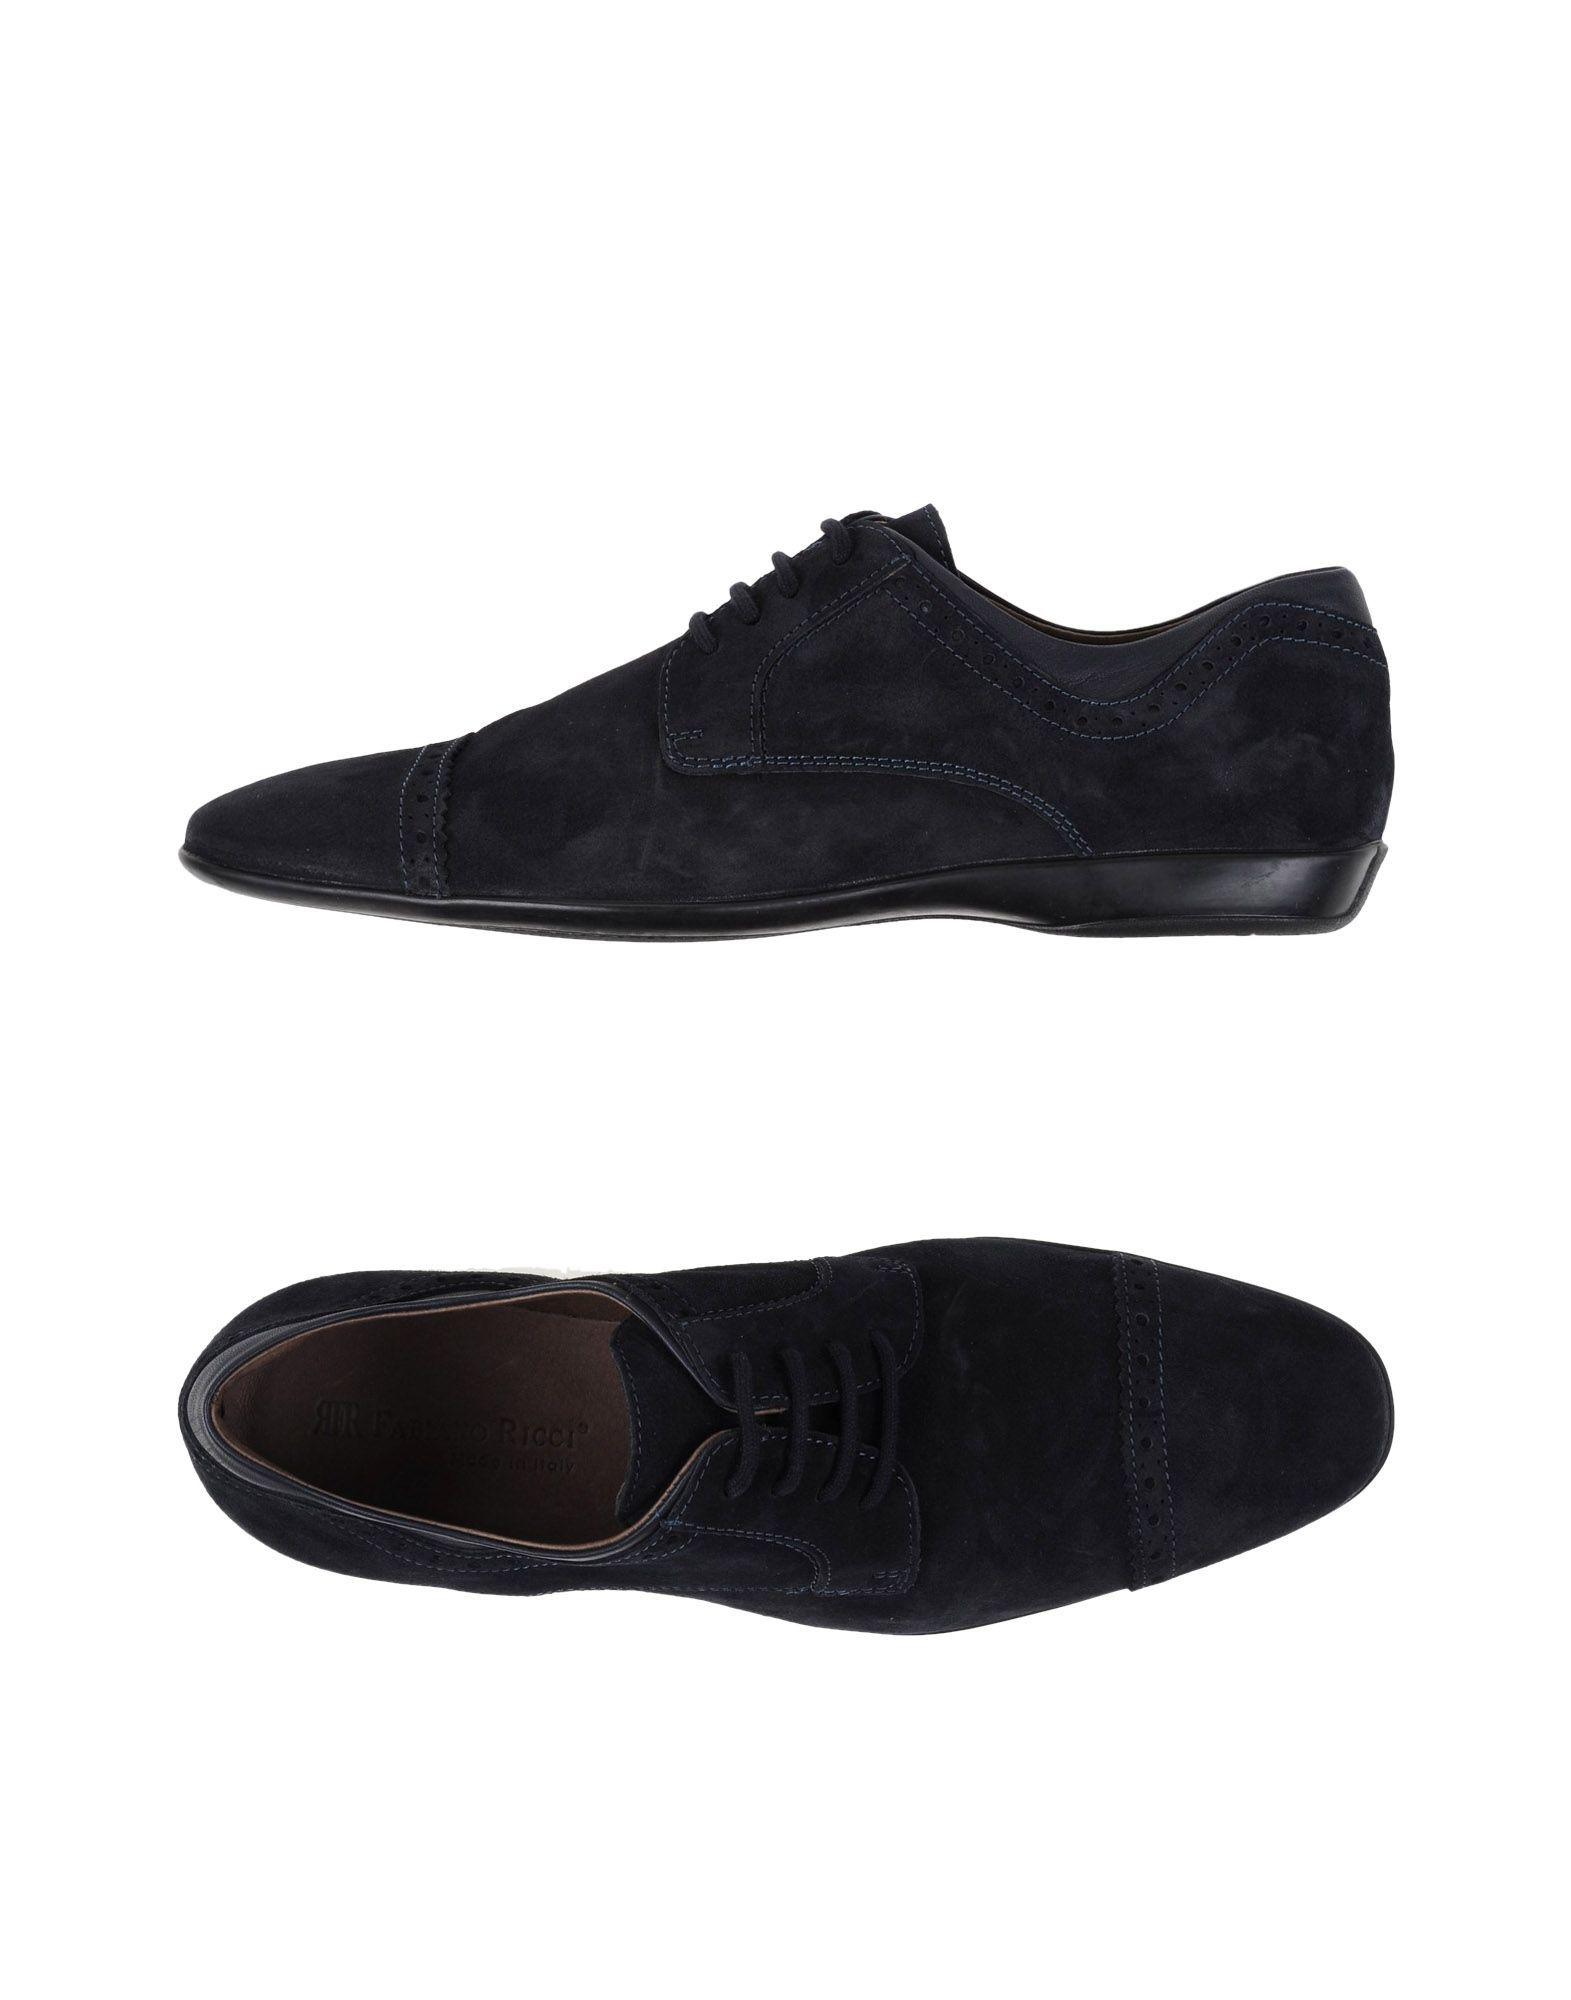 Chaussures - Bottines Fabiano Ricci bDMJJf5F